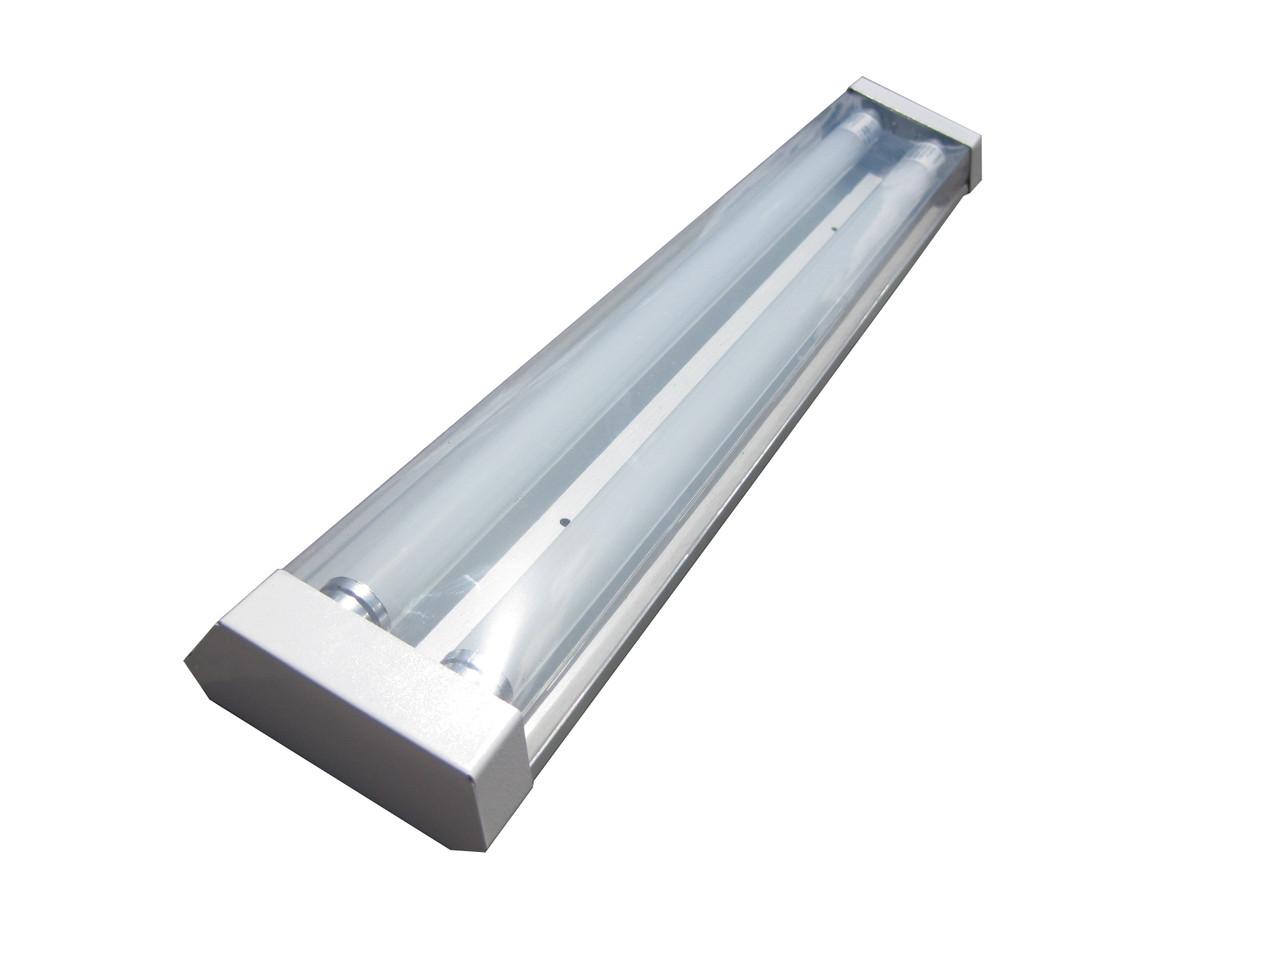 Светильник стекло премиум под LED лампу Т8 2*600мм